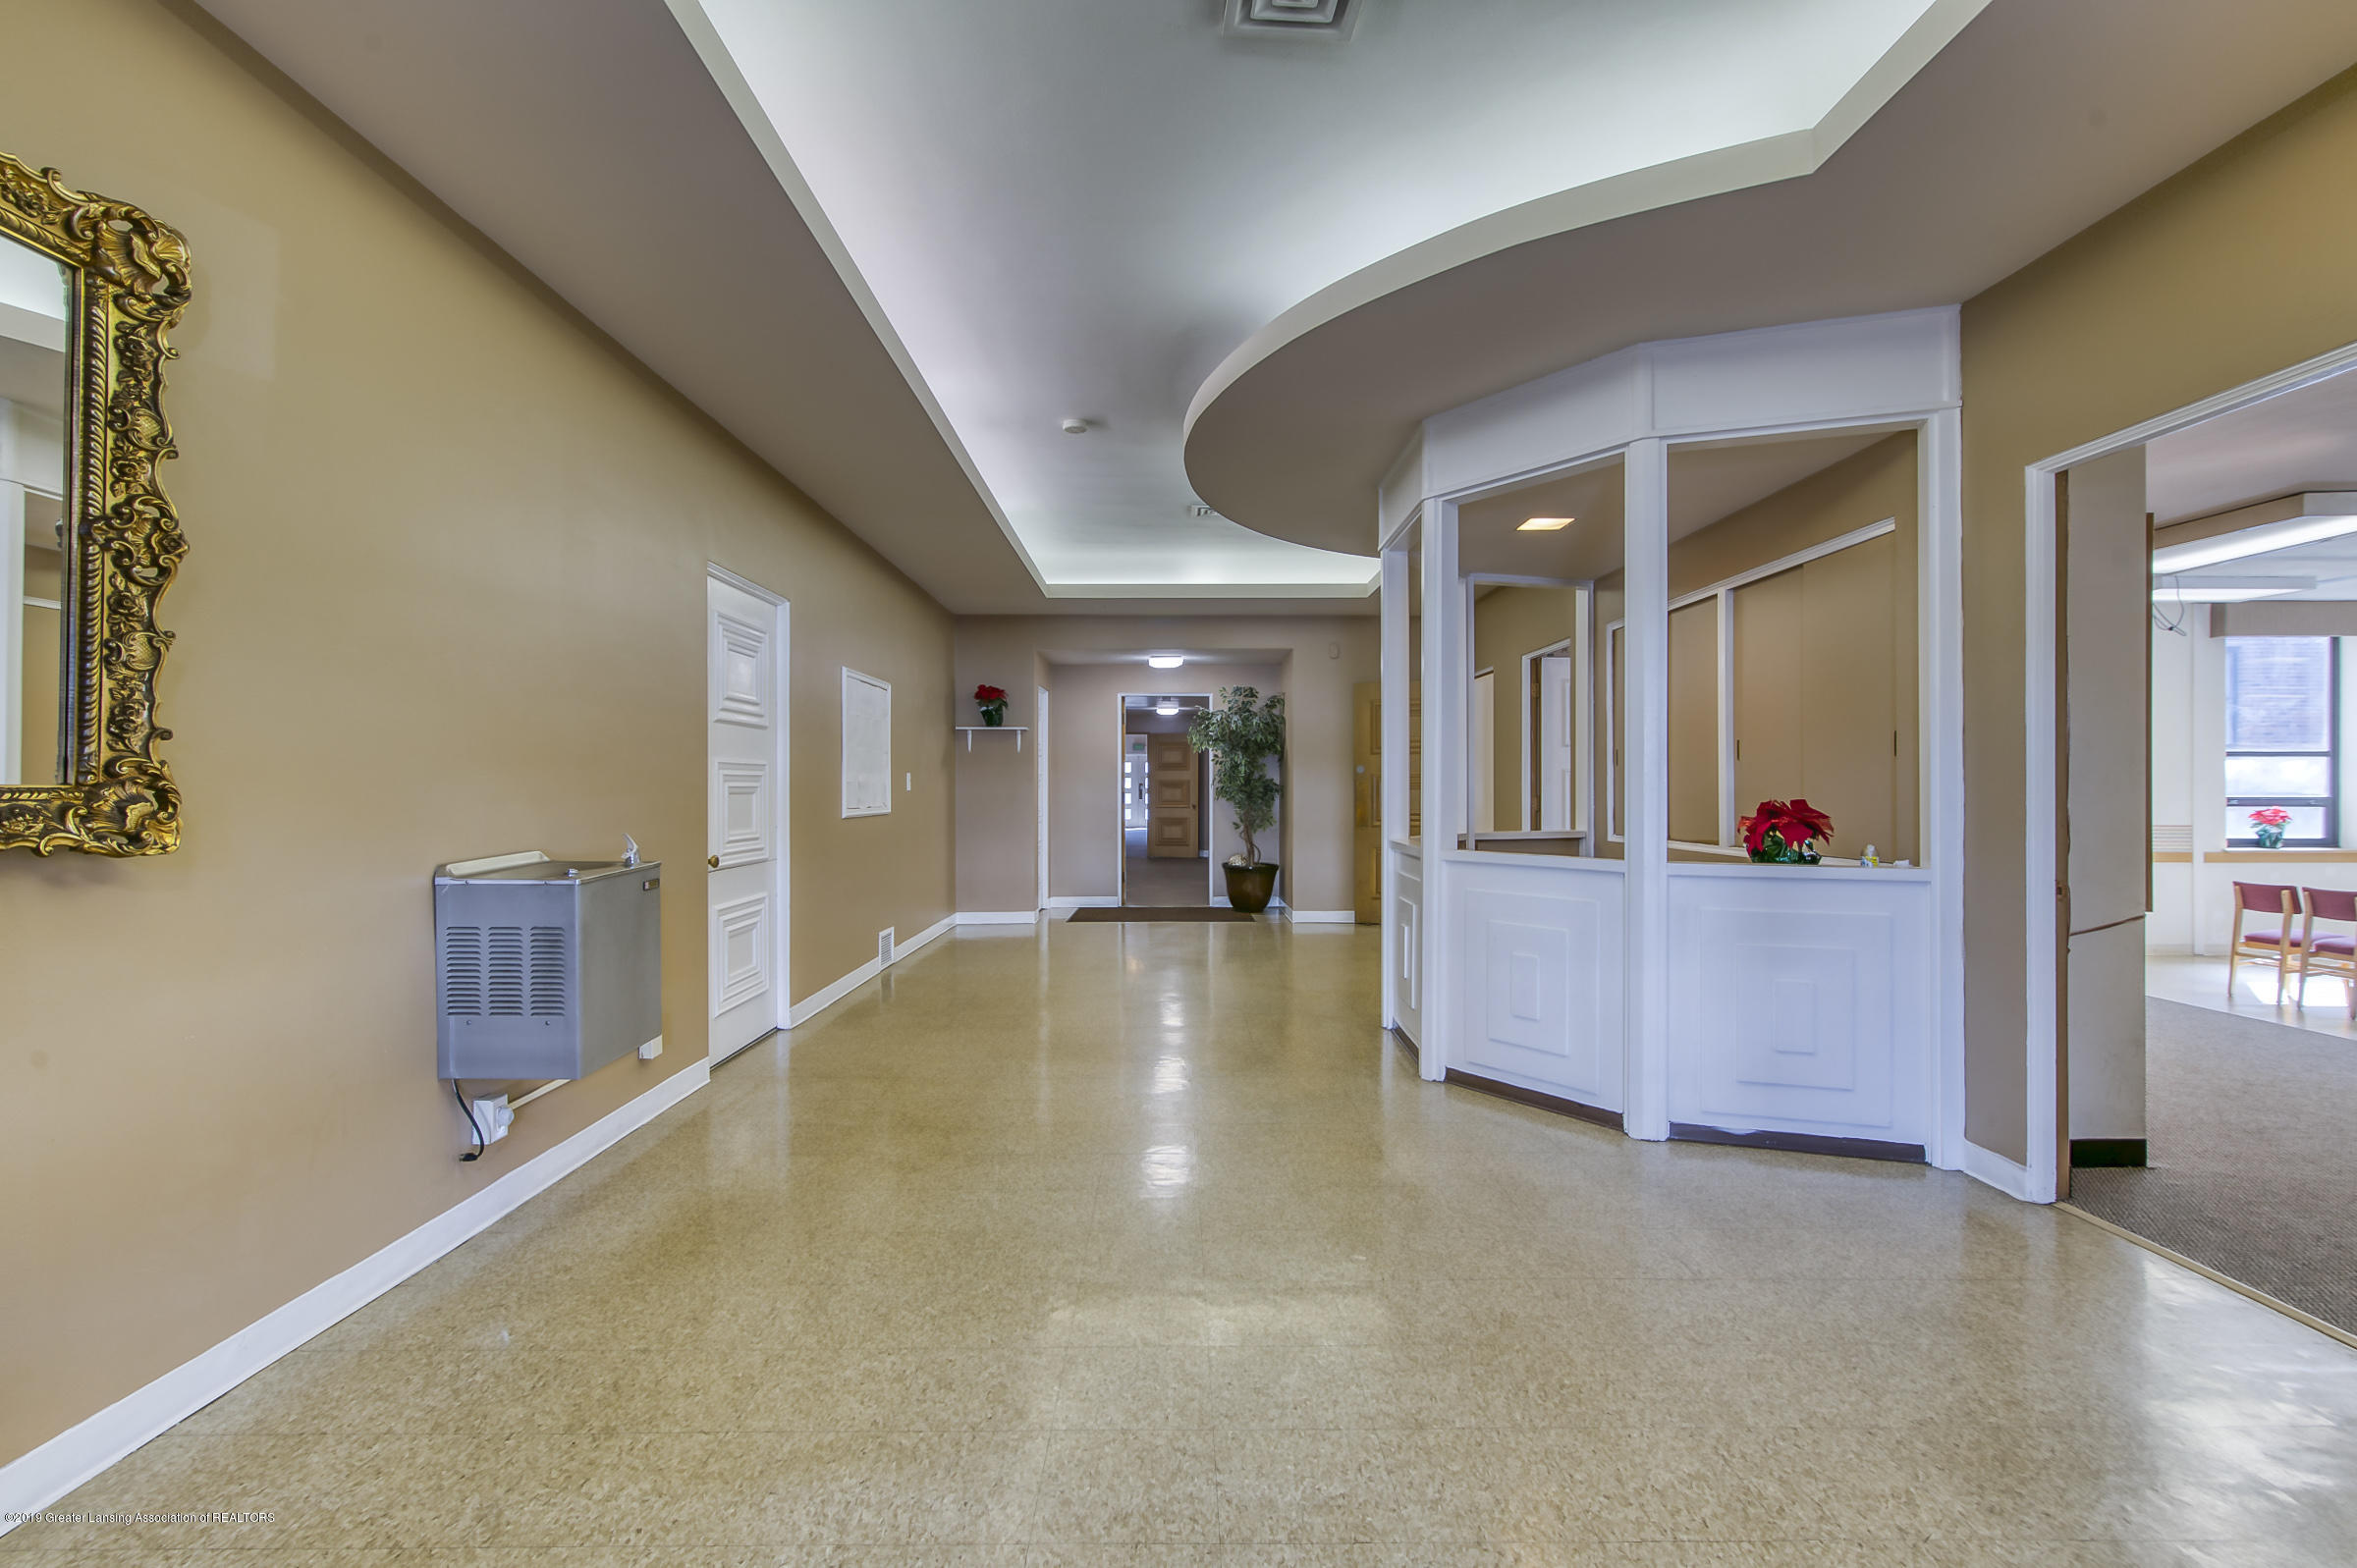 505 Seymour Ave - Corridor - 8